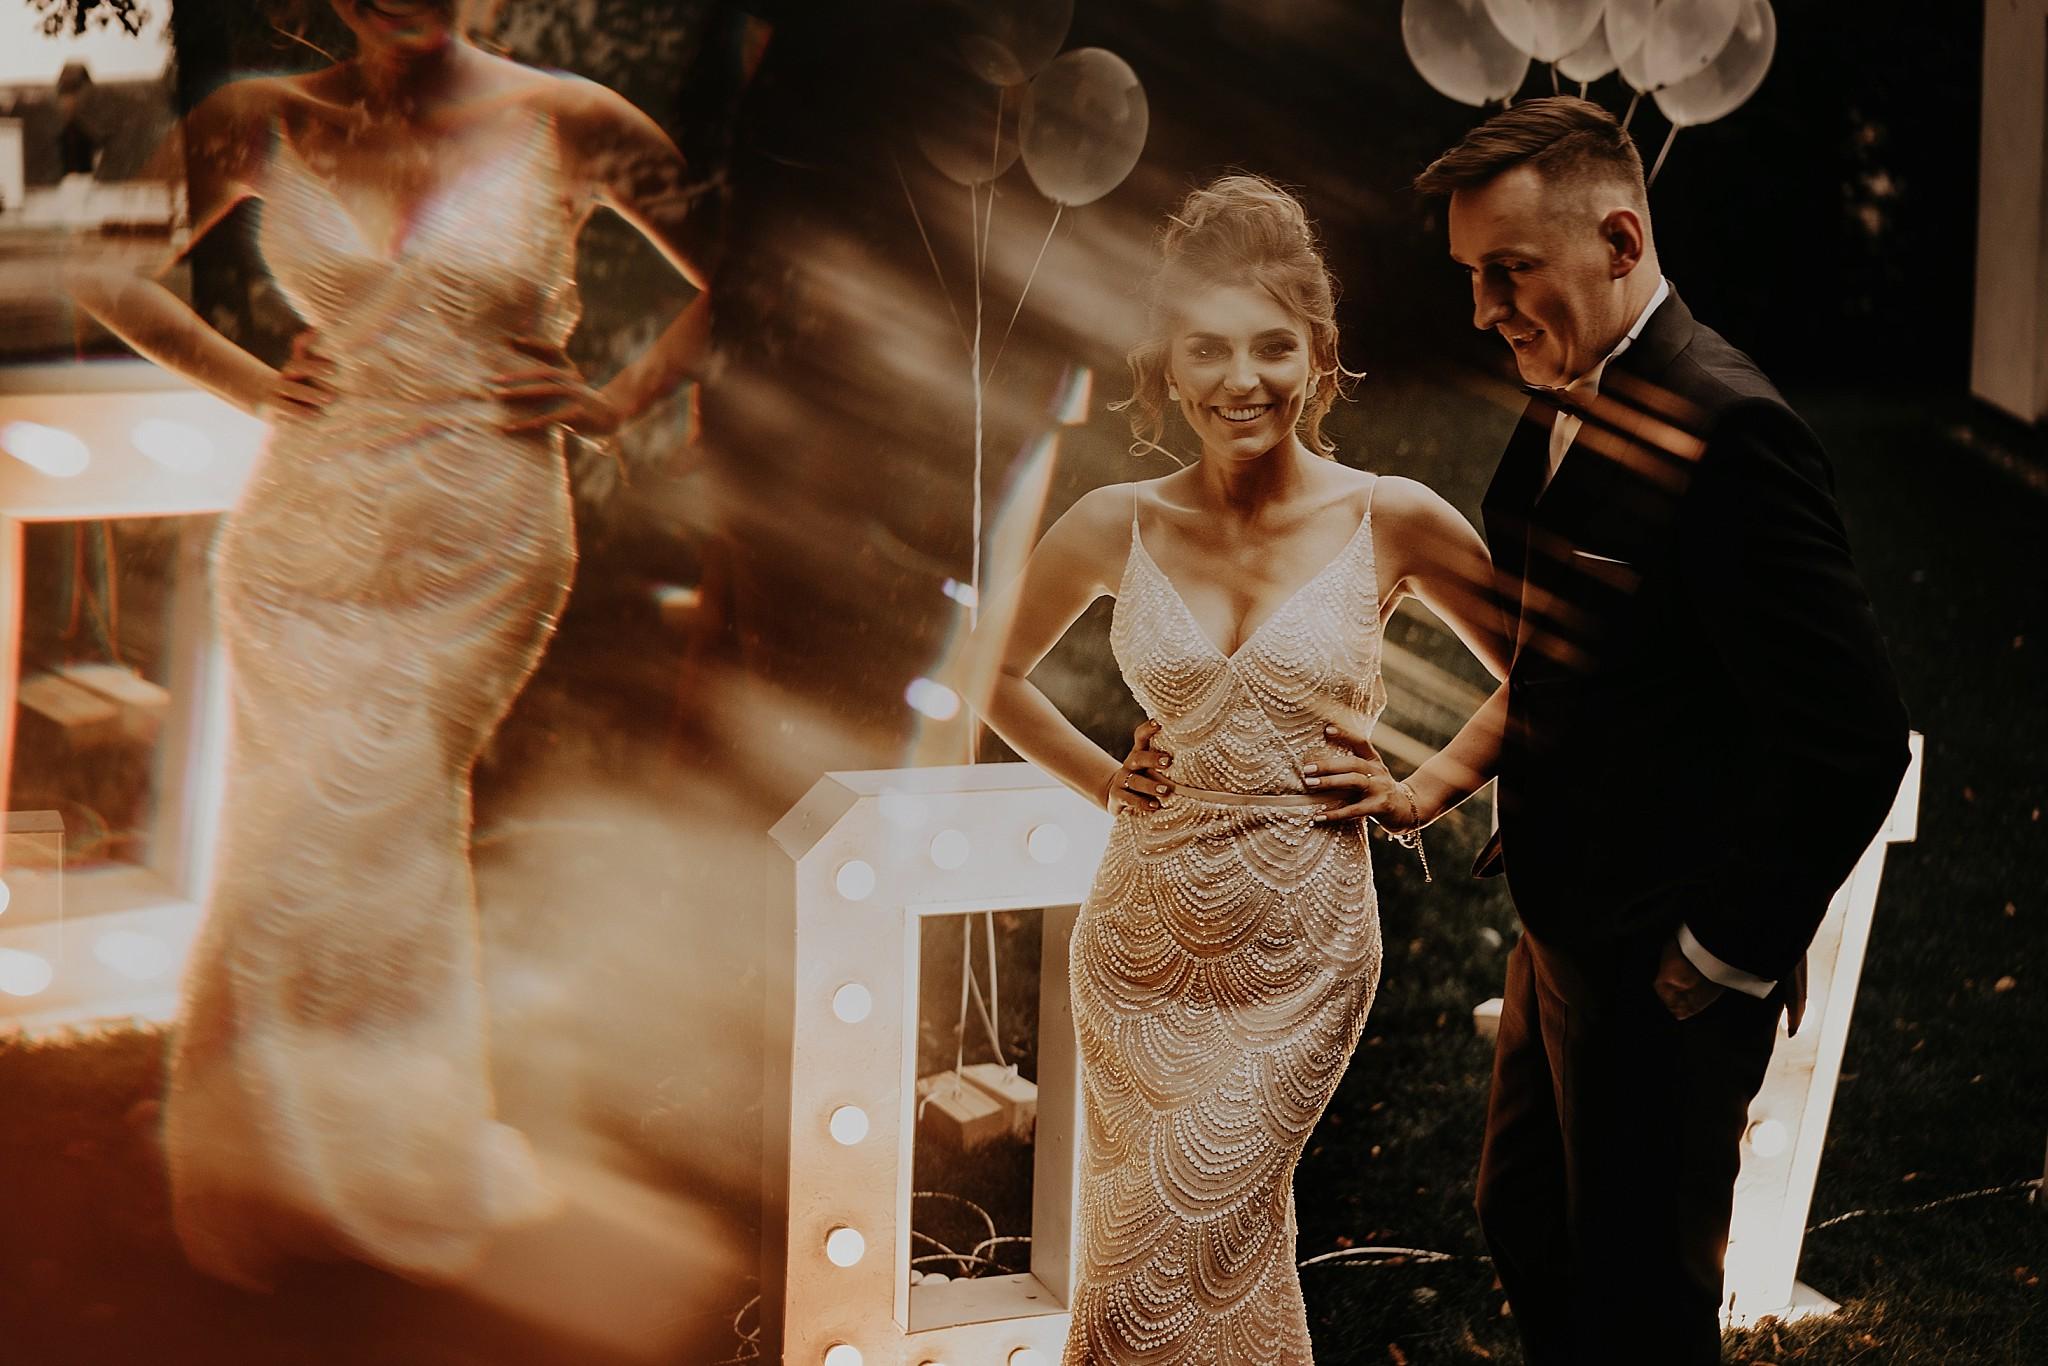 fotograf poznan wesele dobra truskawka piekne wesele pod poznaniem wesele w dobrej truskawce piekna para mloda slub marzen slub koronawirus slub listopad wesele koronawirus 352